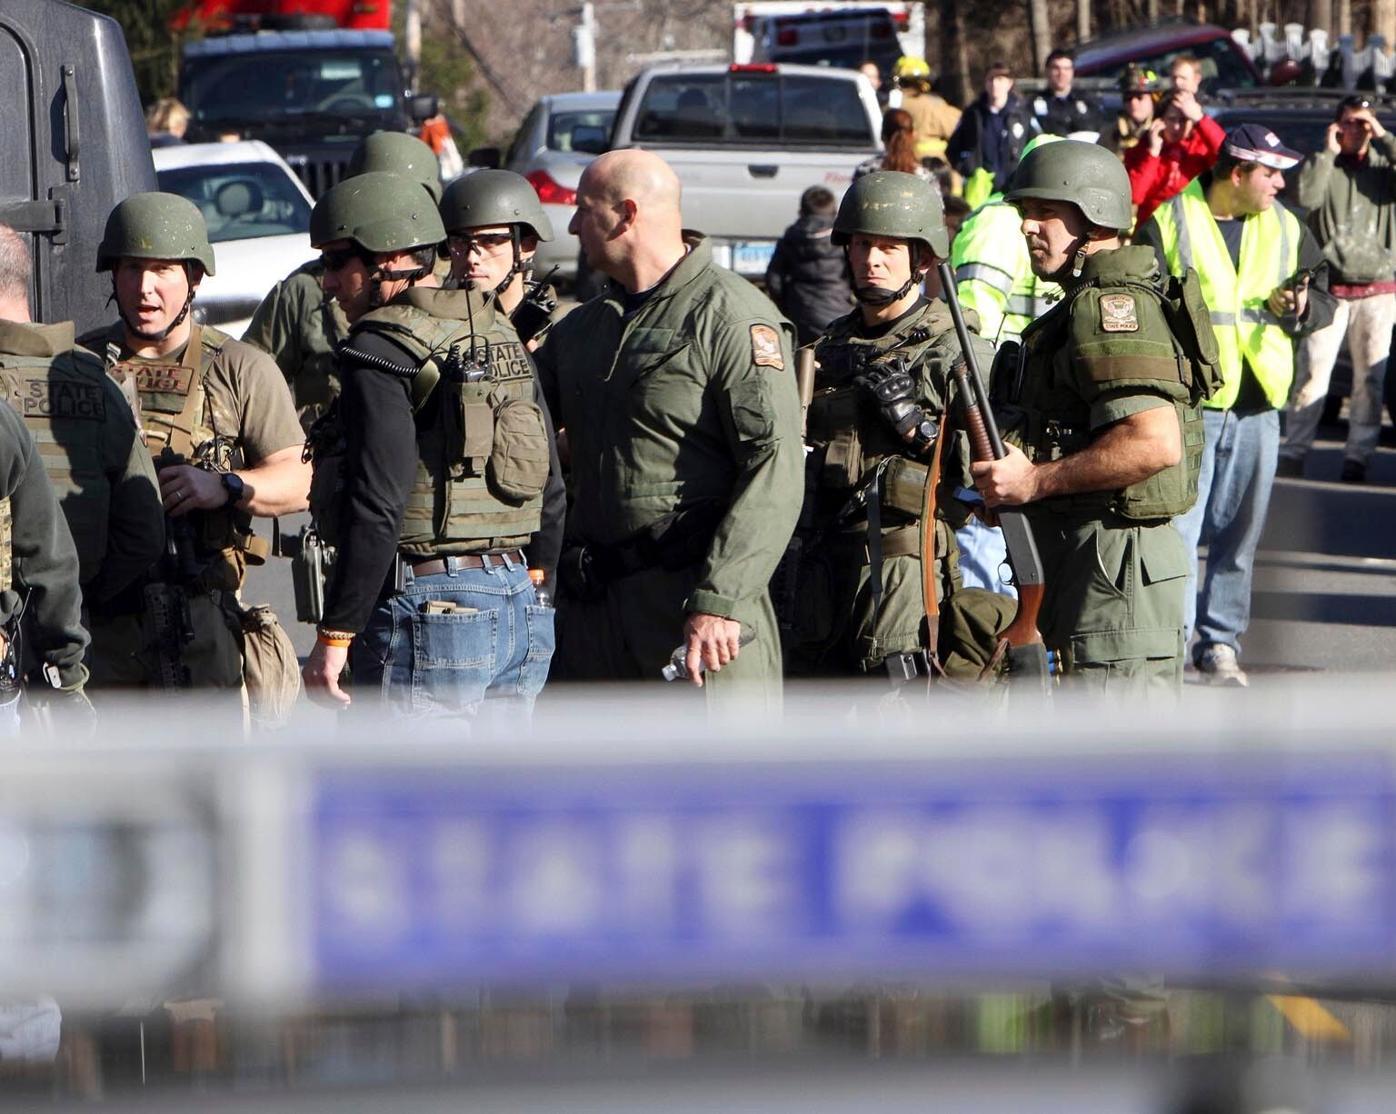 20 children killed at Connecticut elementary school; shooter kills self